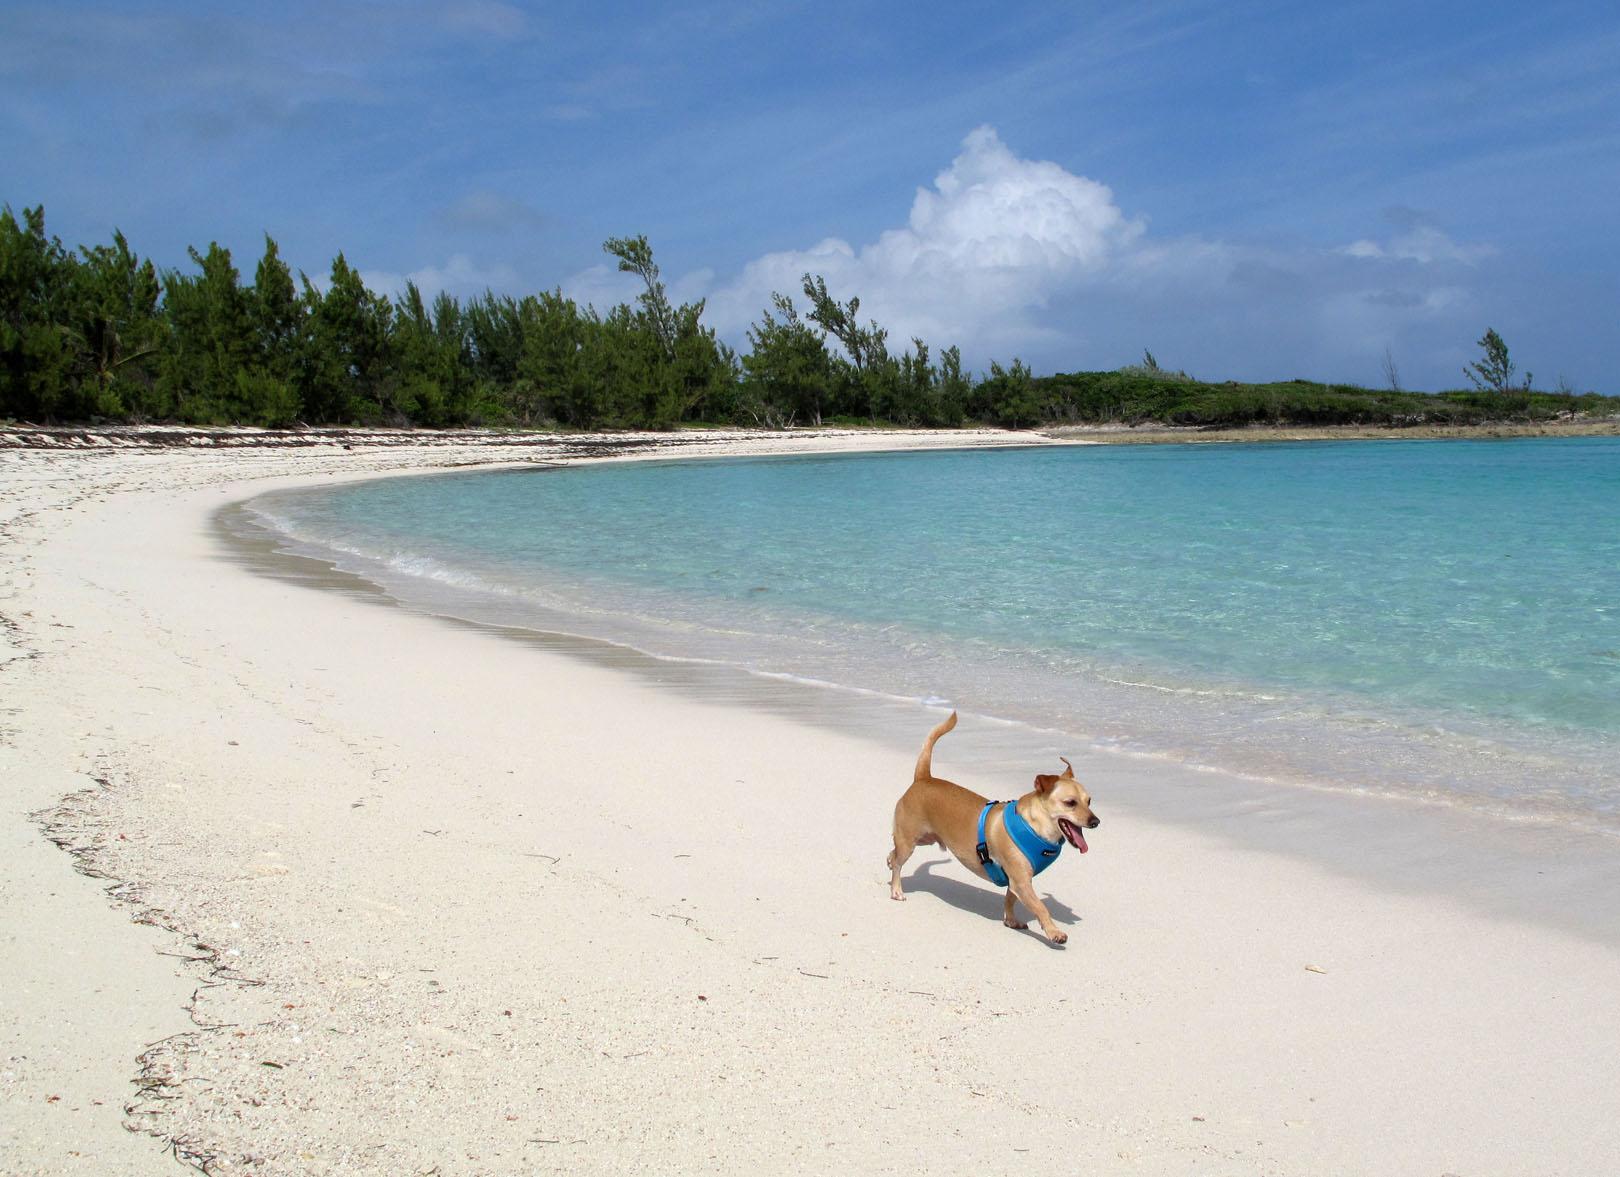 Running on the beach, Bita Bay, Green Turtle Cay, Abaco, Bahamas.